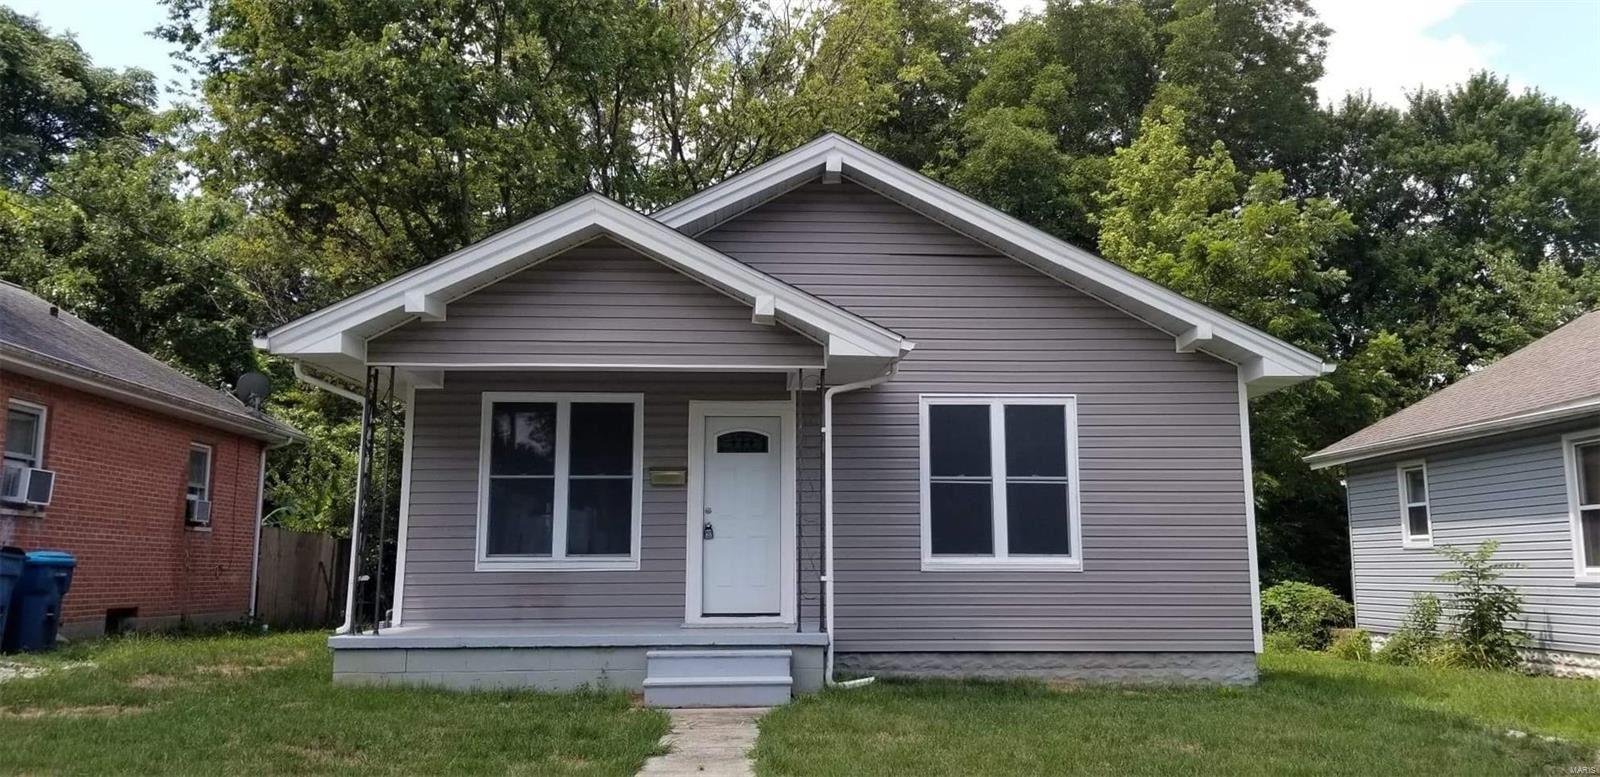 407 North Combs Avenue, Collinsville, IL 62234 - MLS#: 20014995